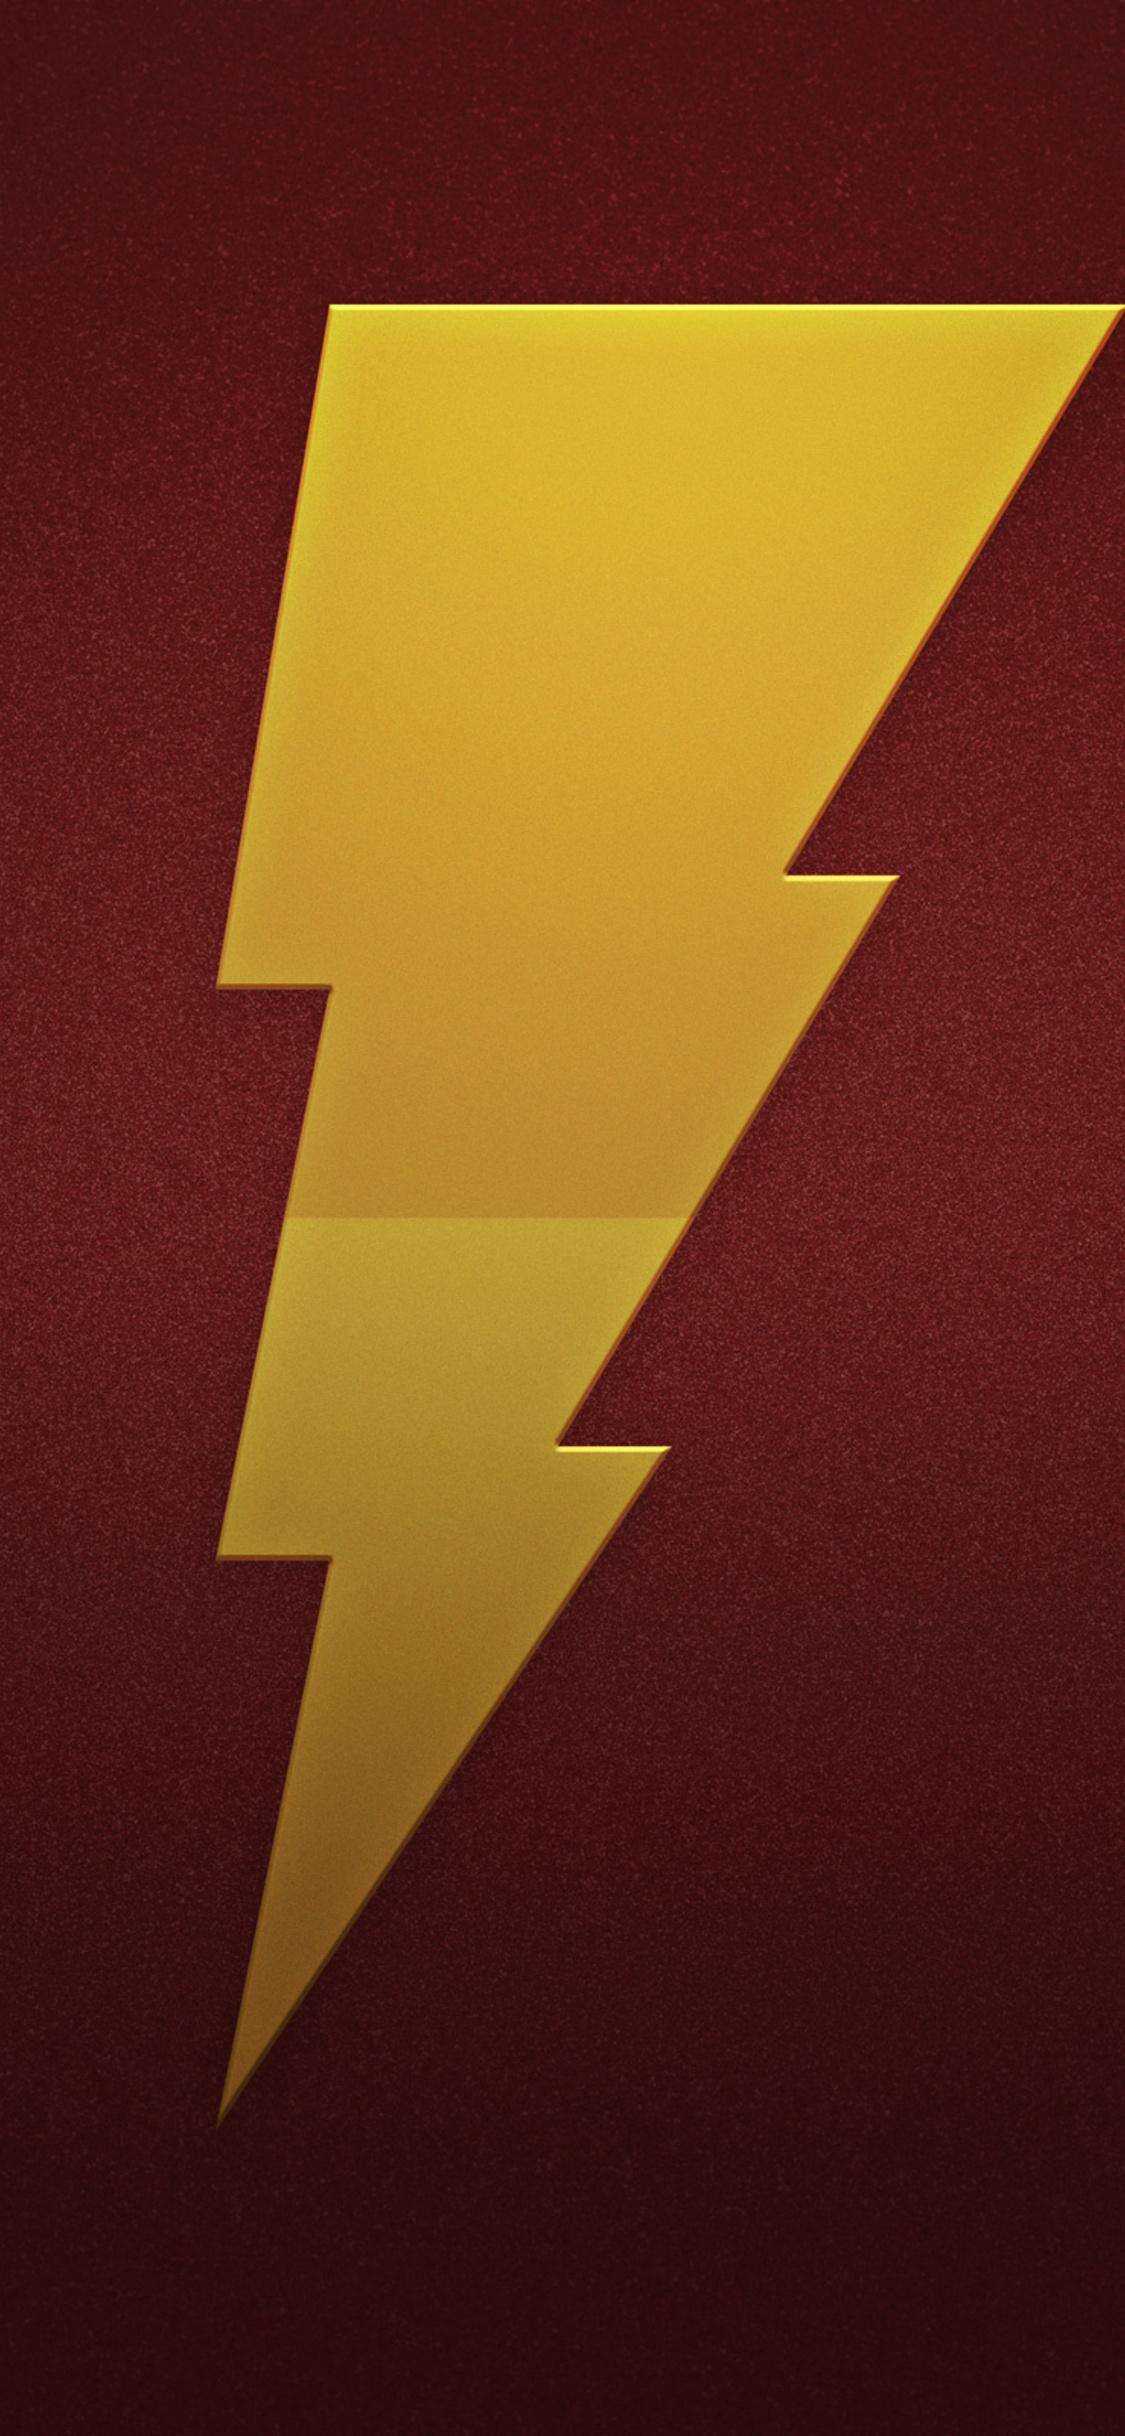 1125x2436 Shazam Logo Iphone Xs Iphone 10 Iphone X Hd 4k Wallpapers